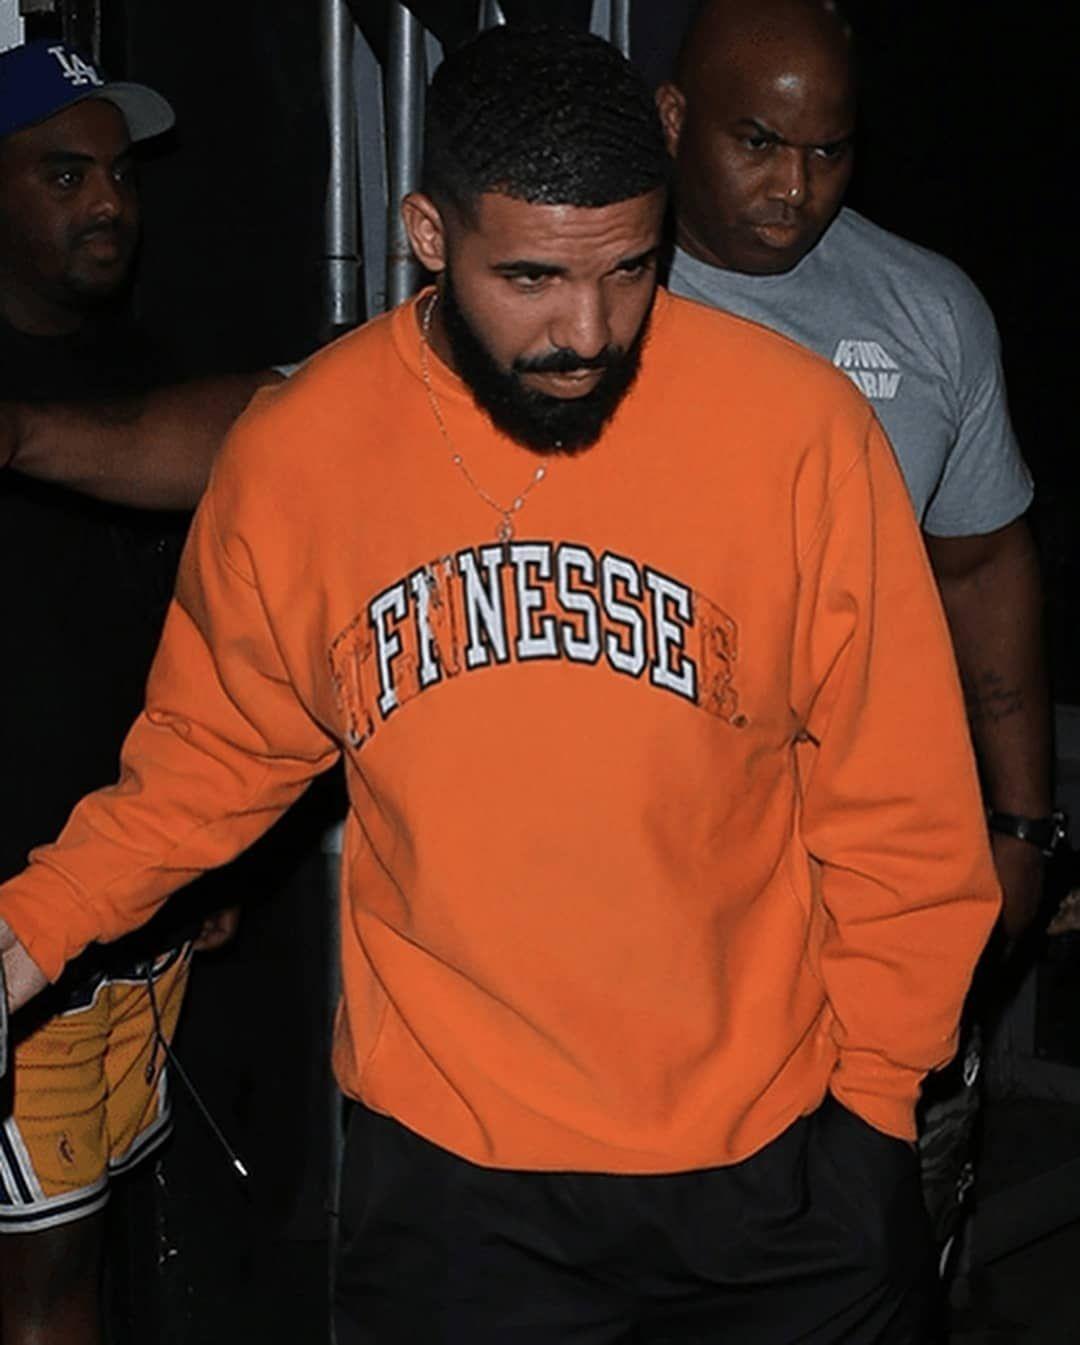 Shirt Brand New As worn by Drake Finesse Tennessee Orange Sweatshirt